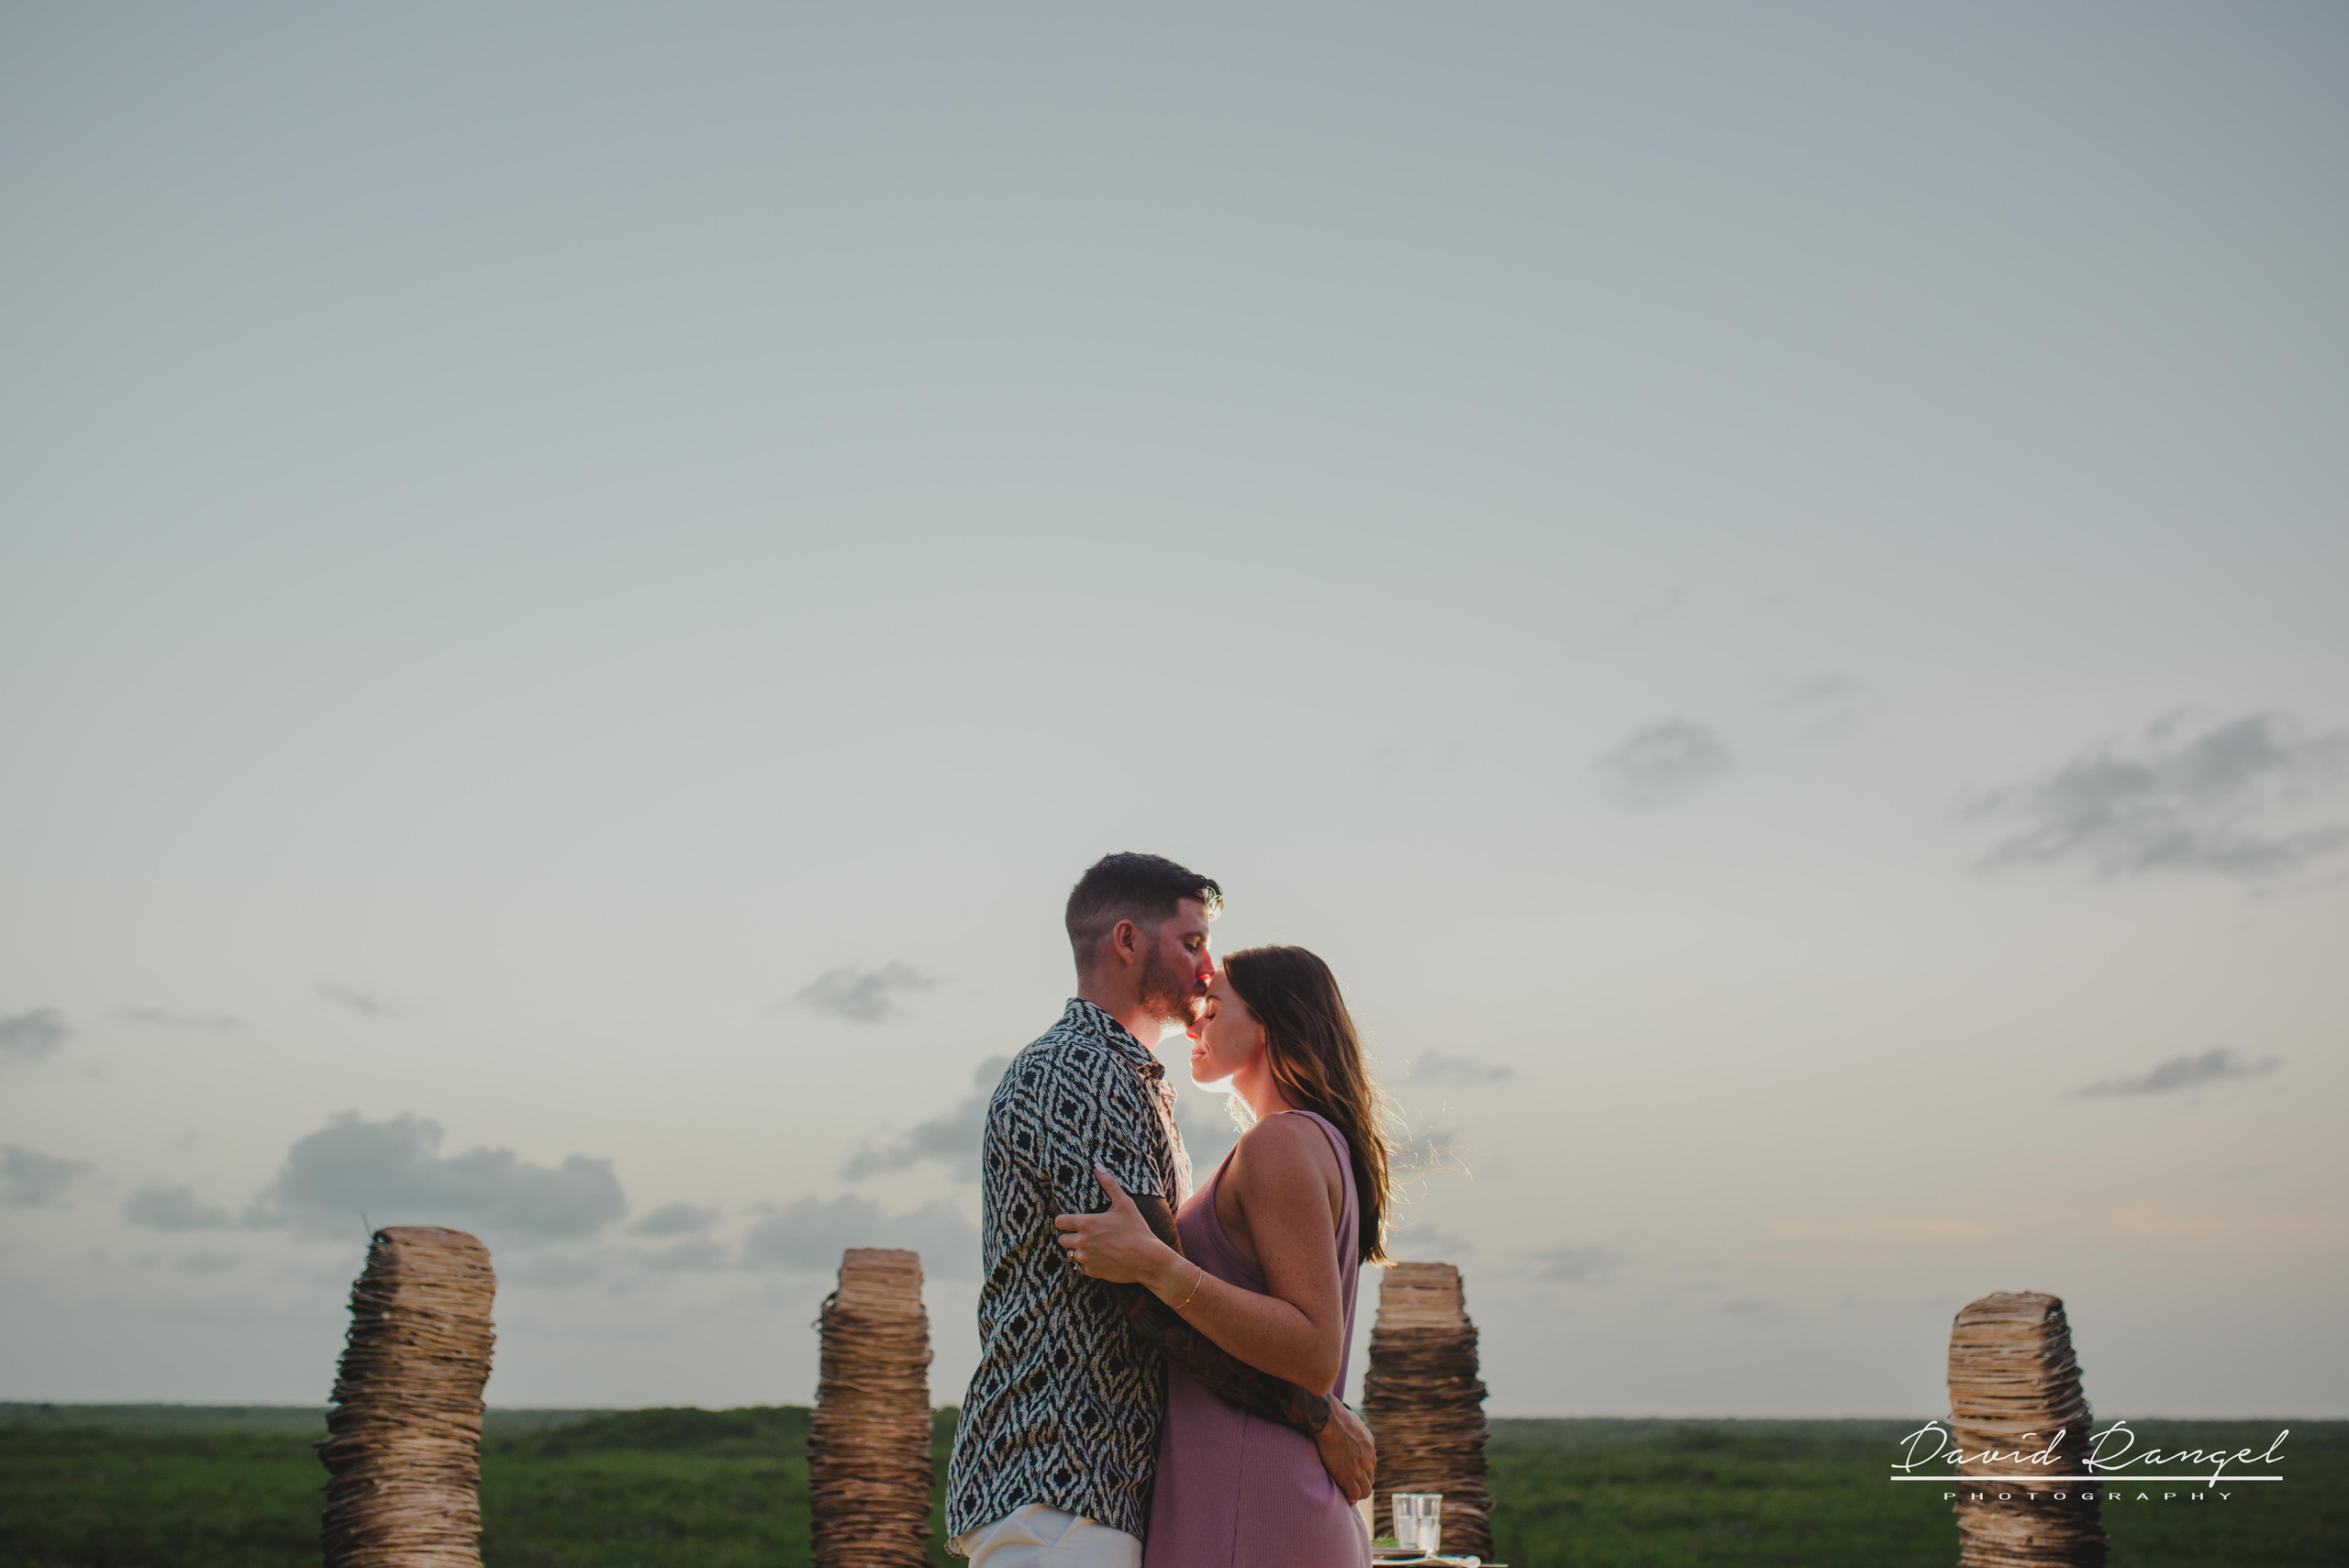 proposal+engagement+couple+dinner+hun+tulum+love+garden+nature+overthetrees+session+photoshot+destination+photographer+photo